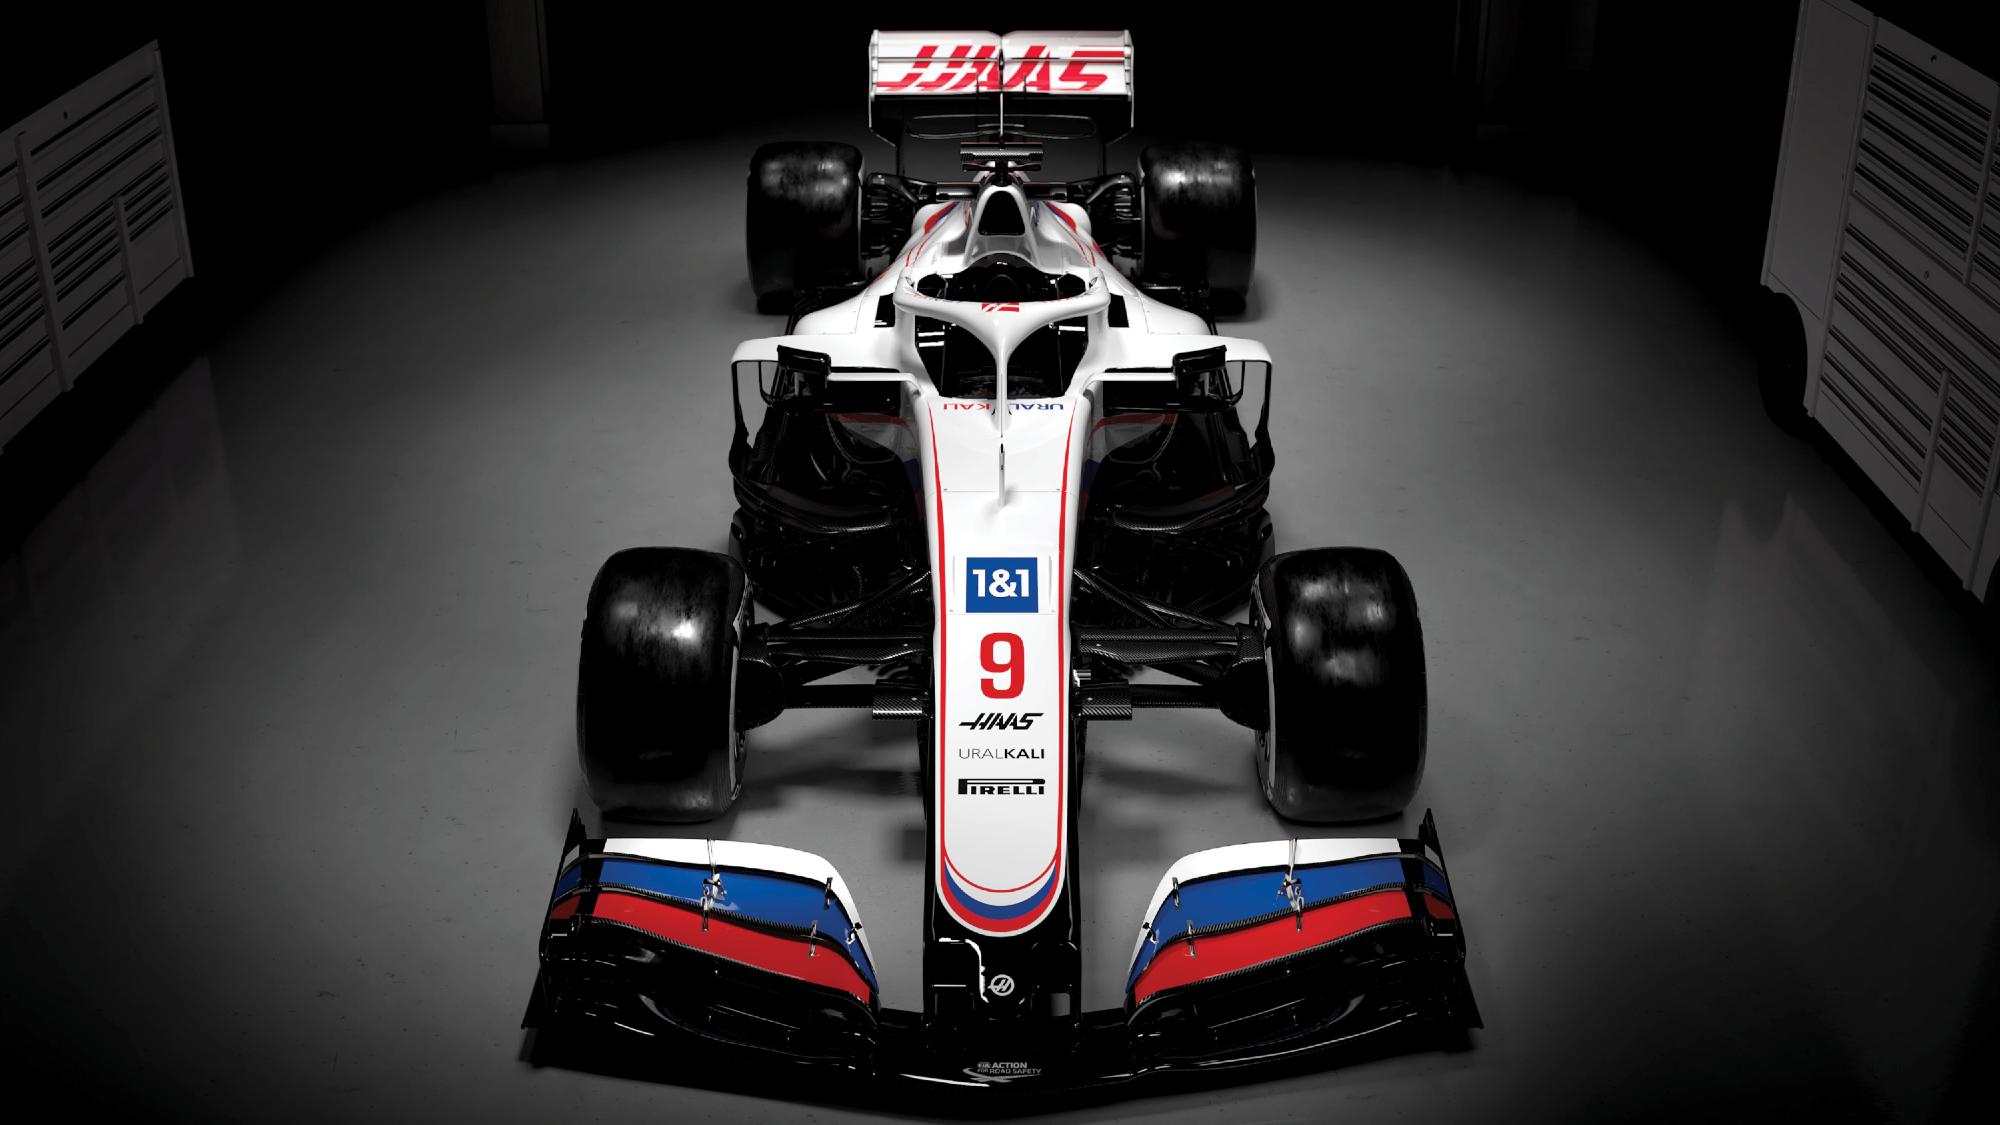 2021 Haas VF21 F1 livery